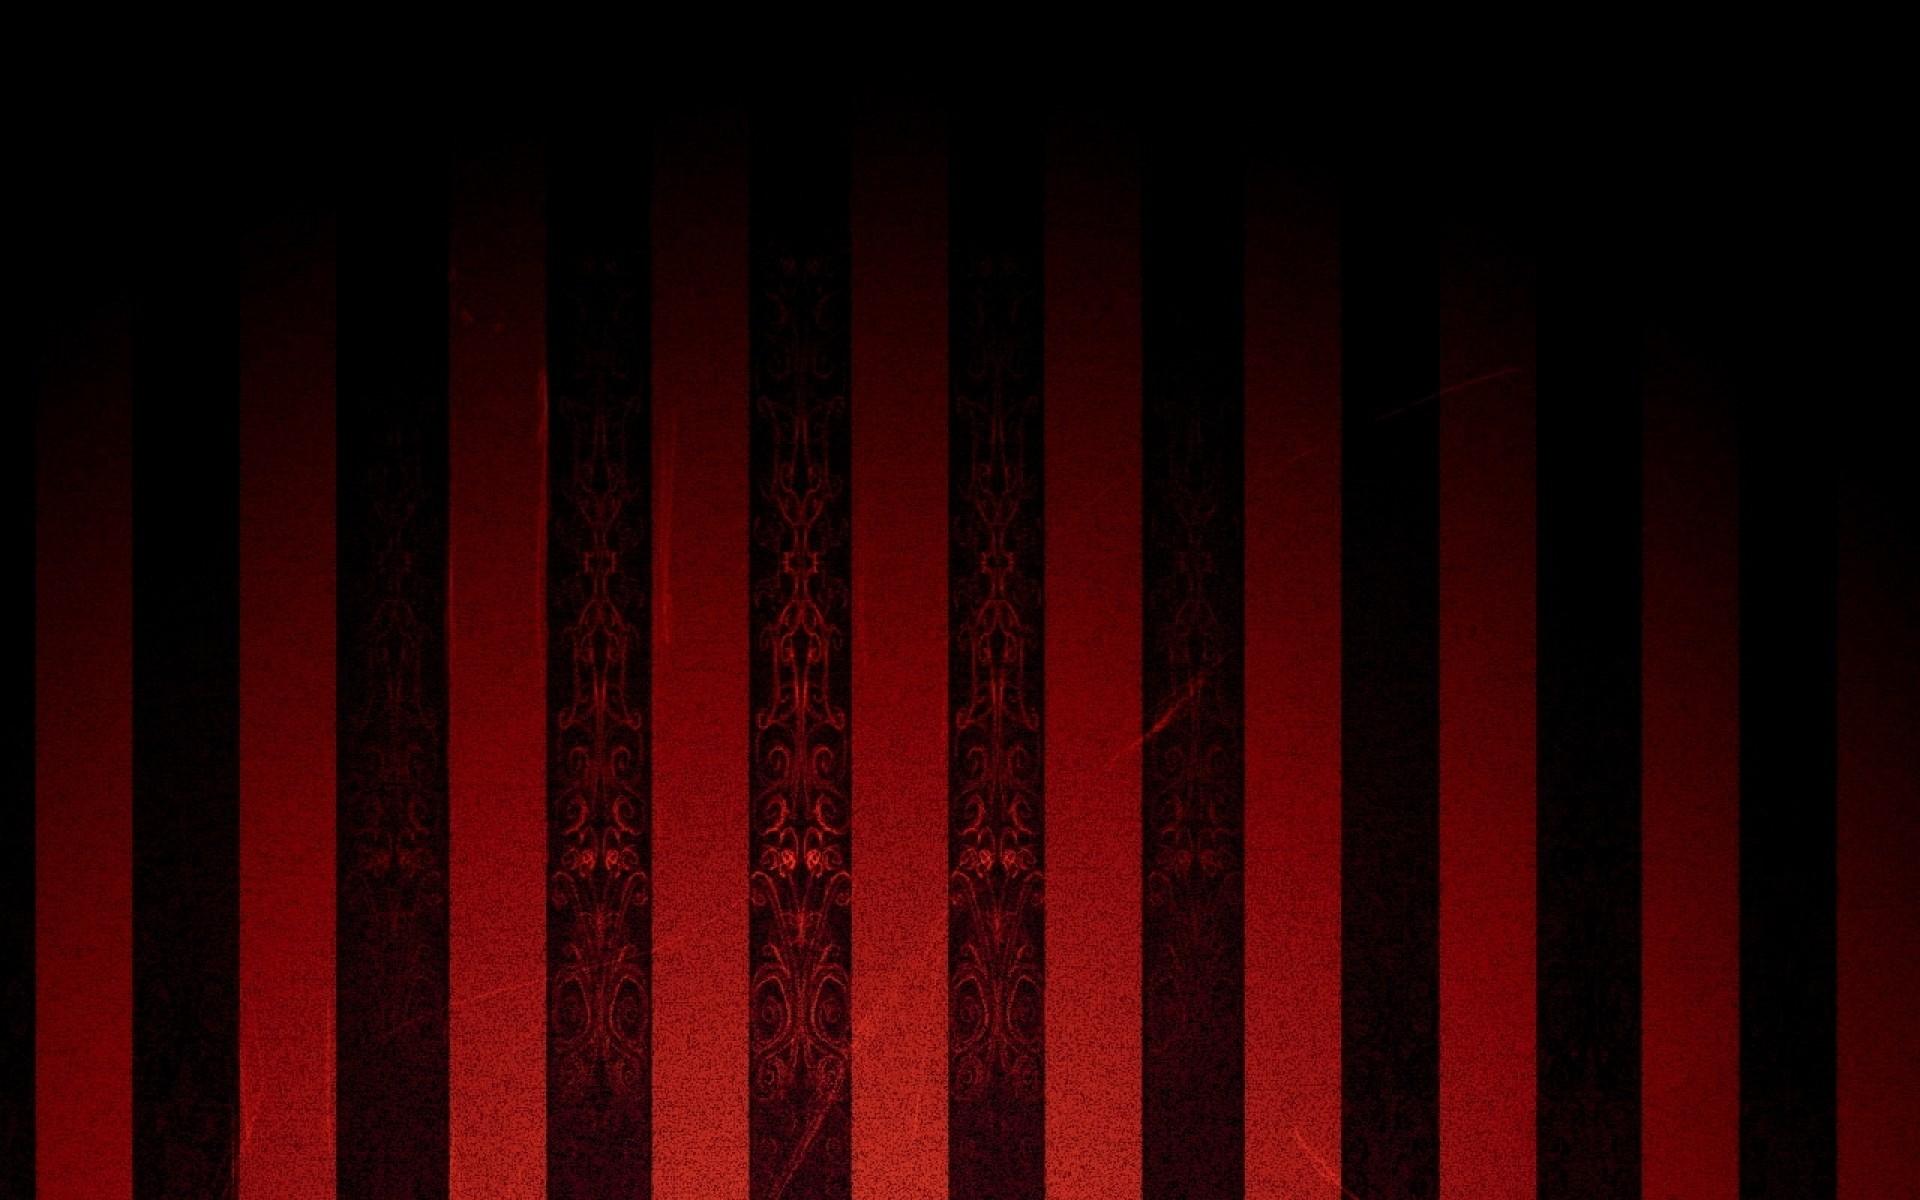 wallpapers free wallpapers red desktop wallpapers examples of black .